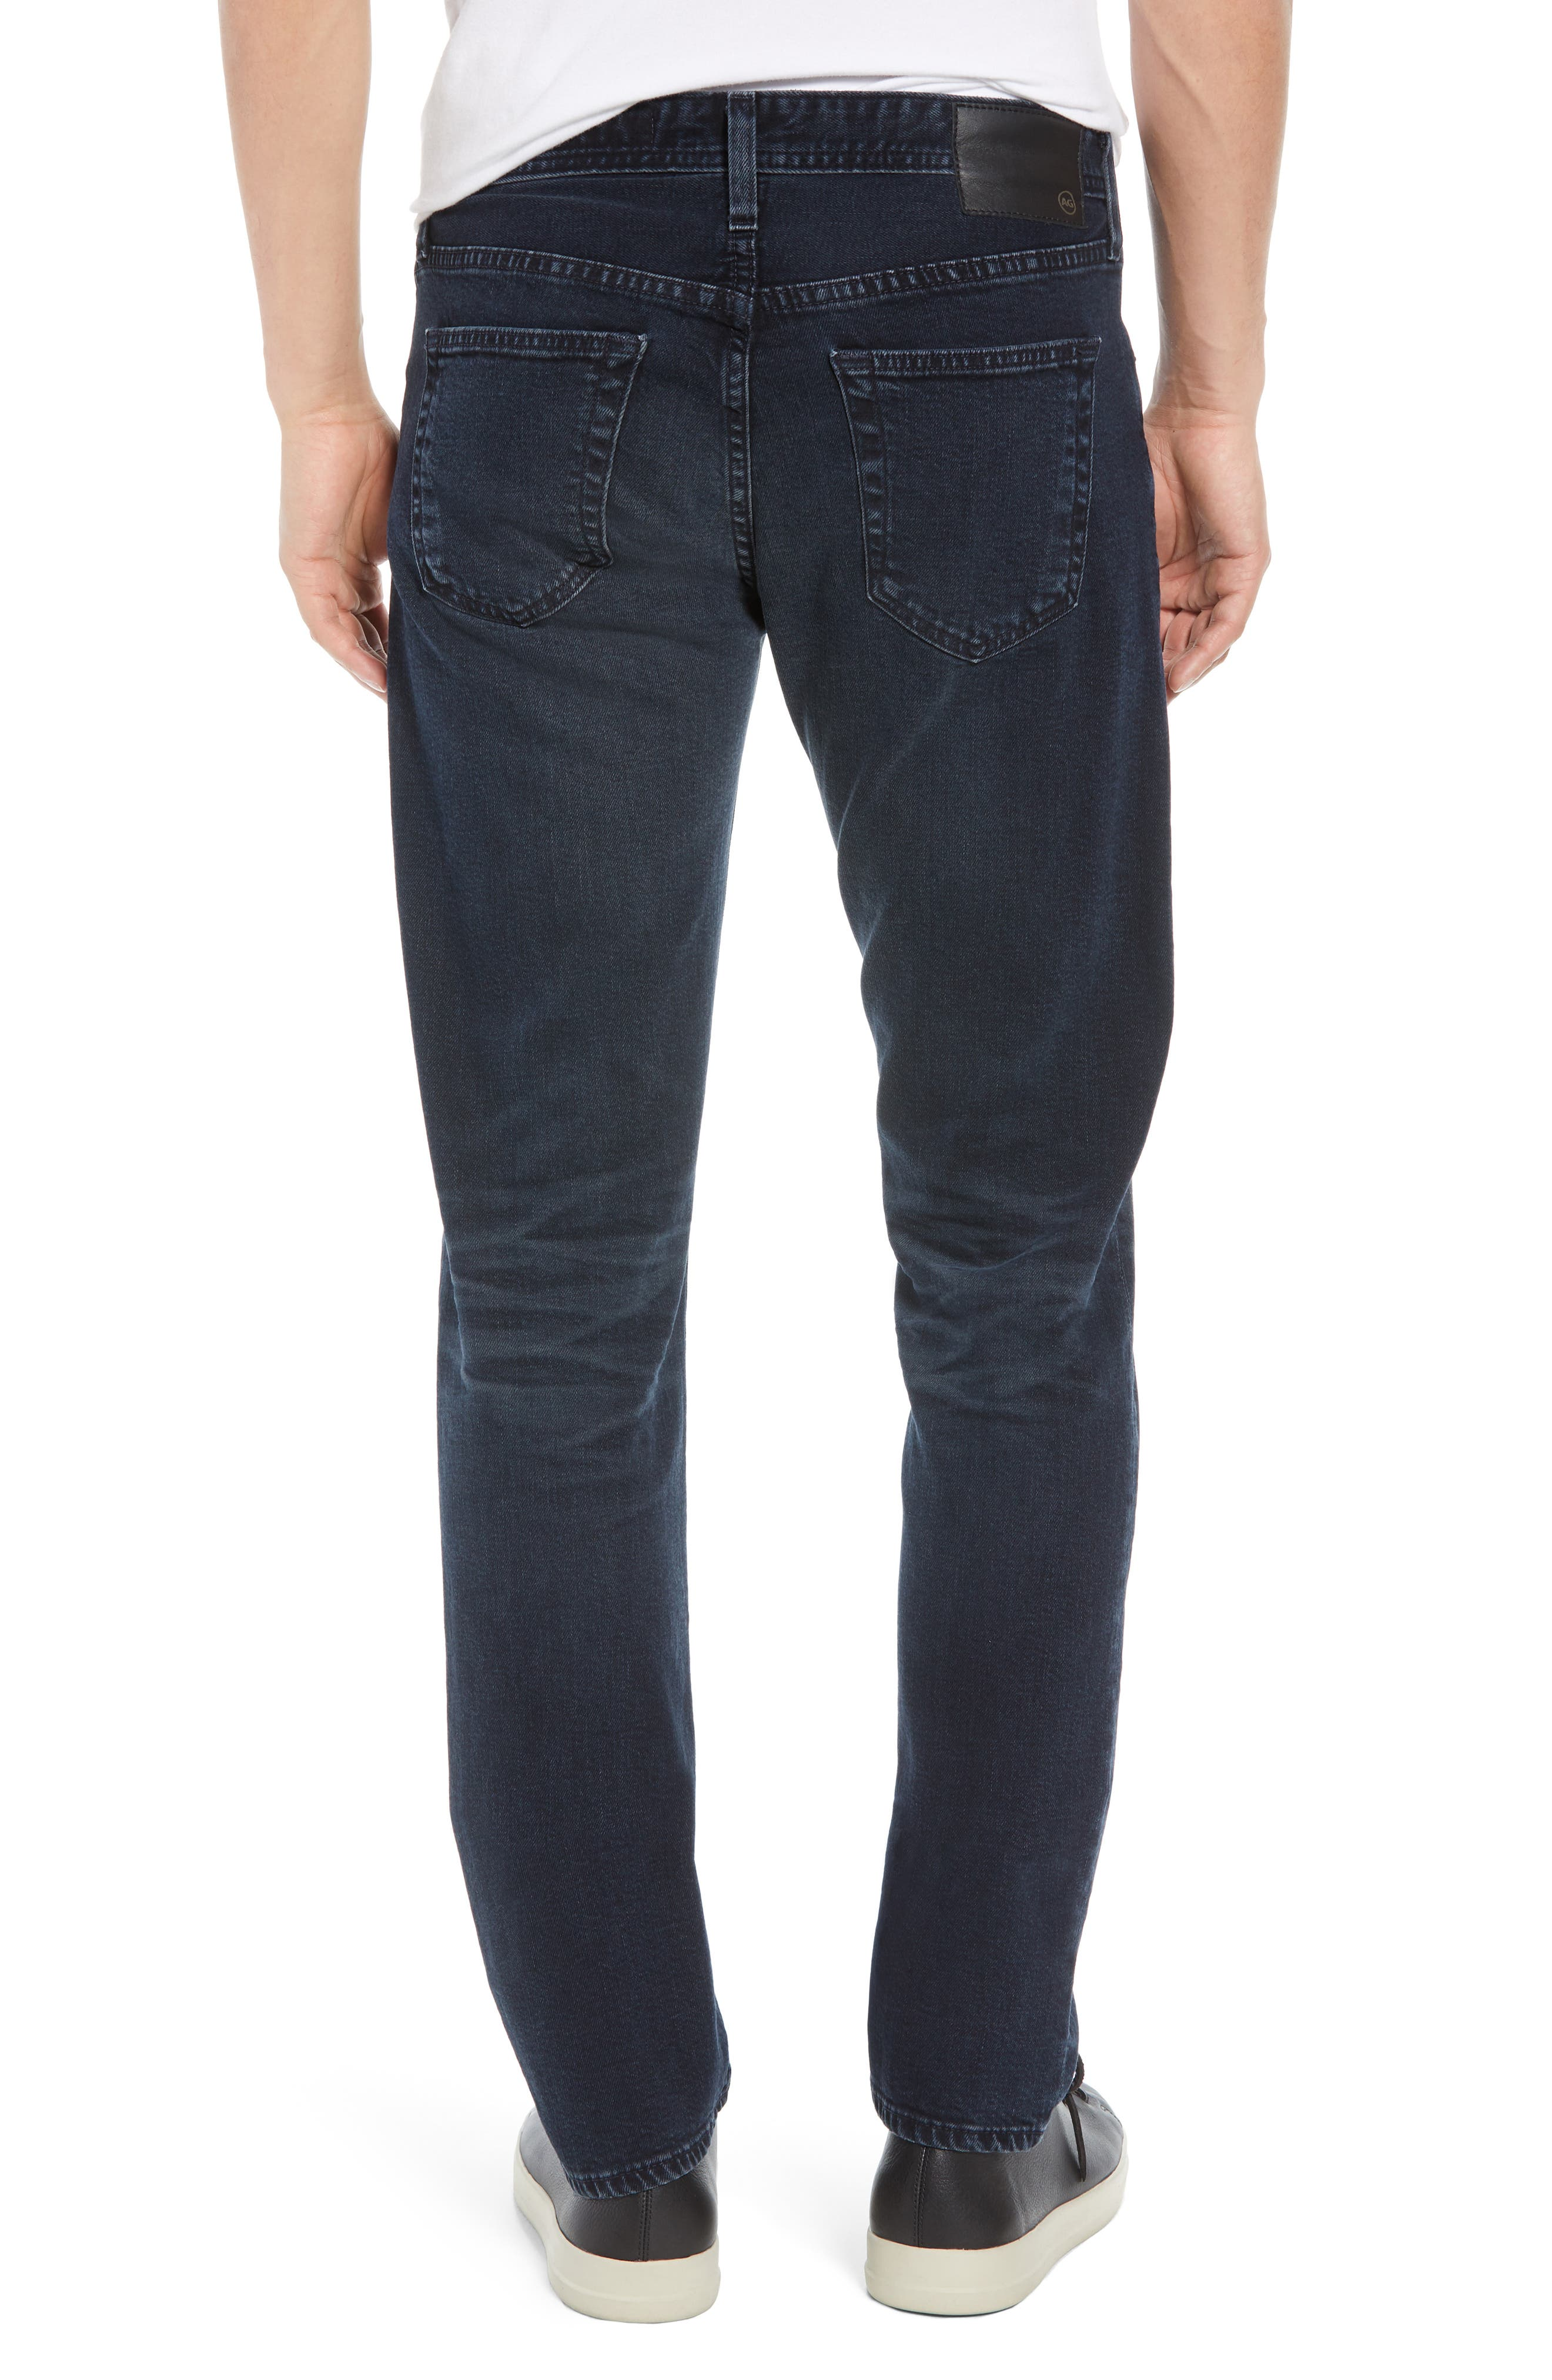 Tellis Slim Fit Jeans,                             Alternate thumbnail 2, color,                             2 YEARS RUMBLE